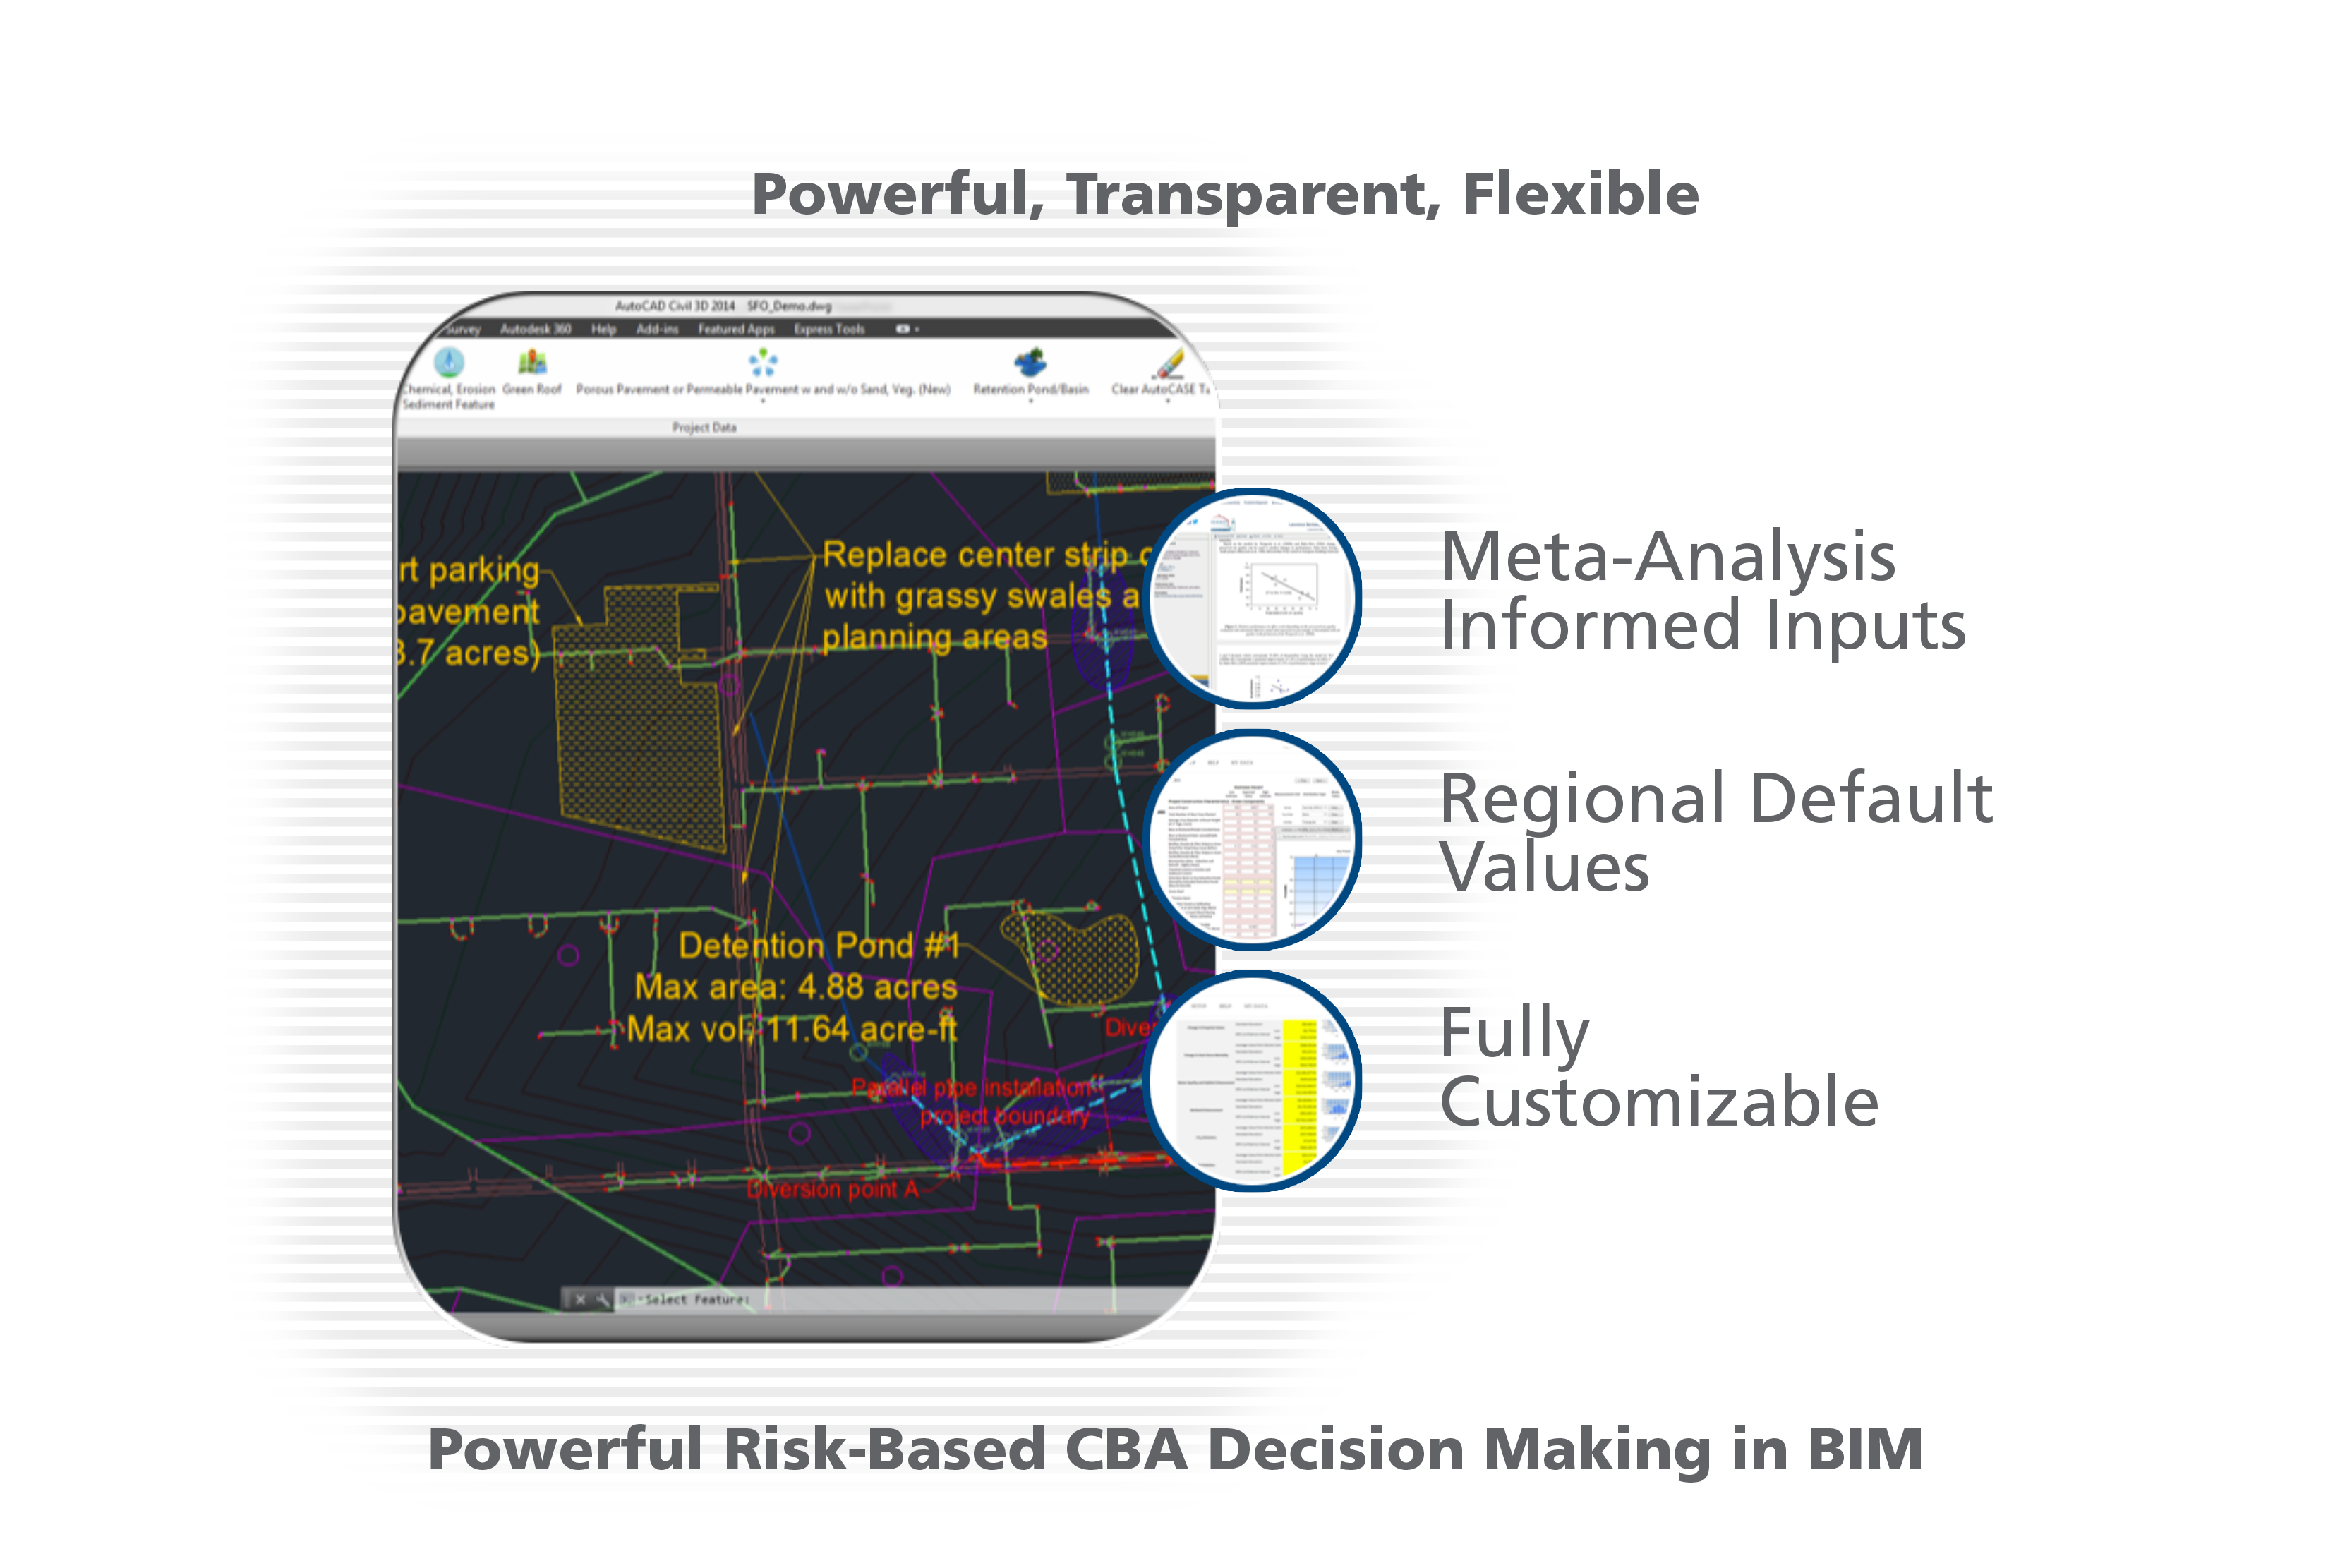 CBA Decision-Making in BIM